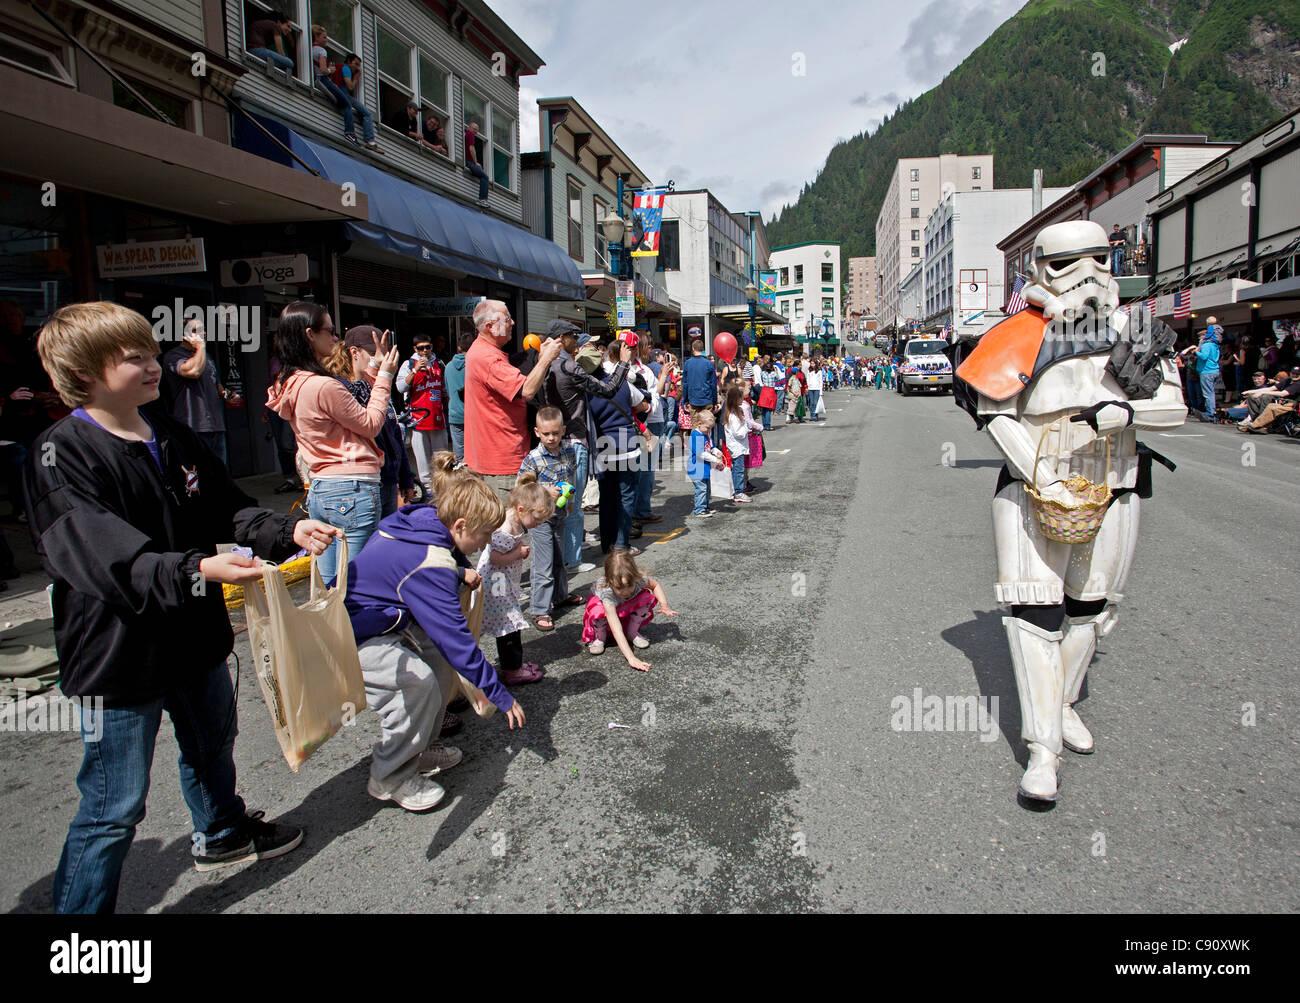 Man with star wars disguise. 4th July parade. Juneau. Alaska. USA - Stock Image